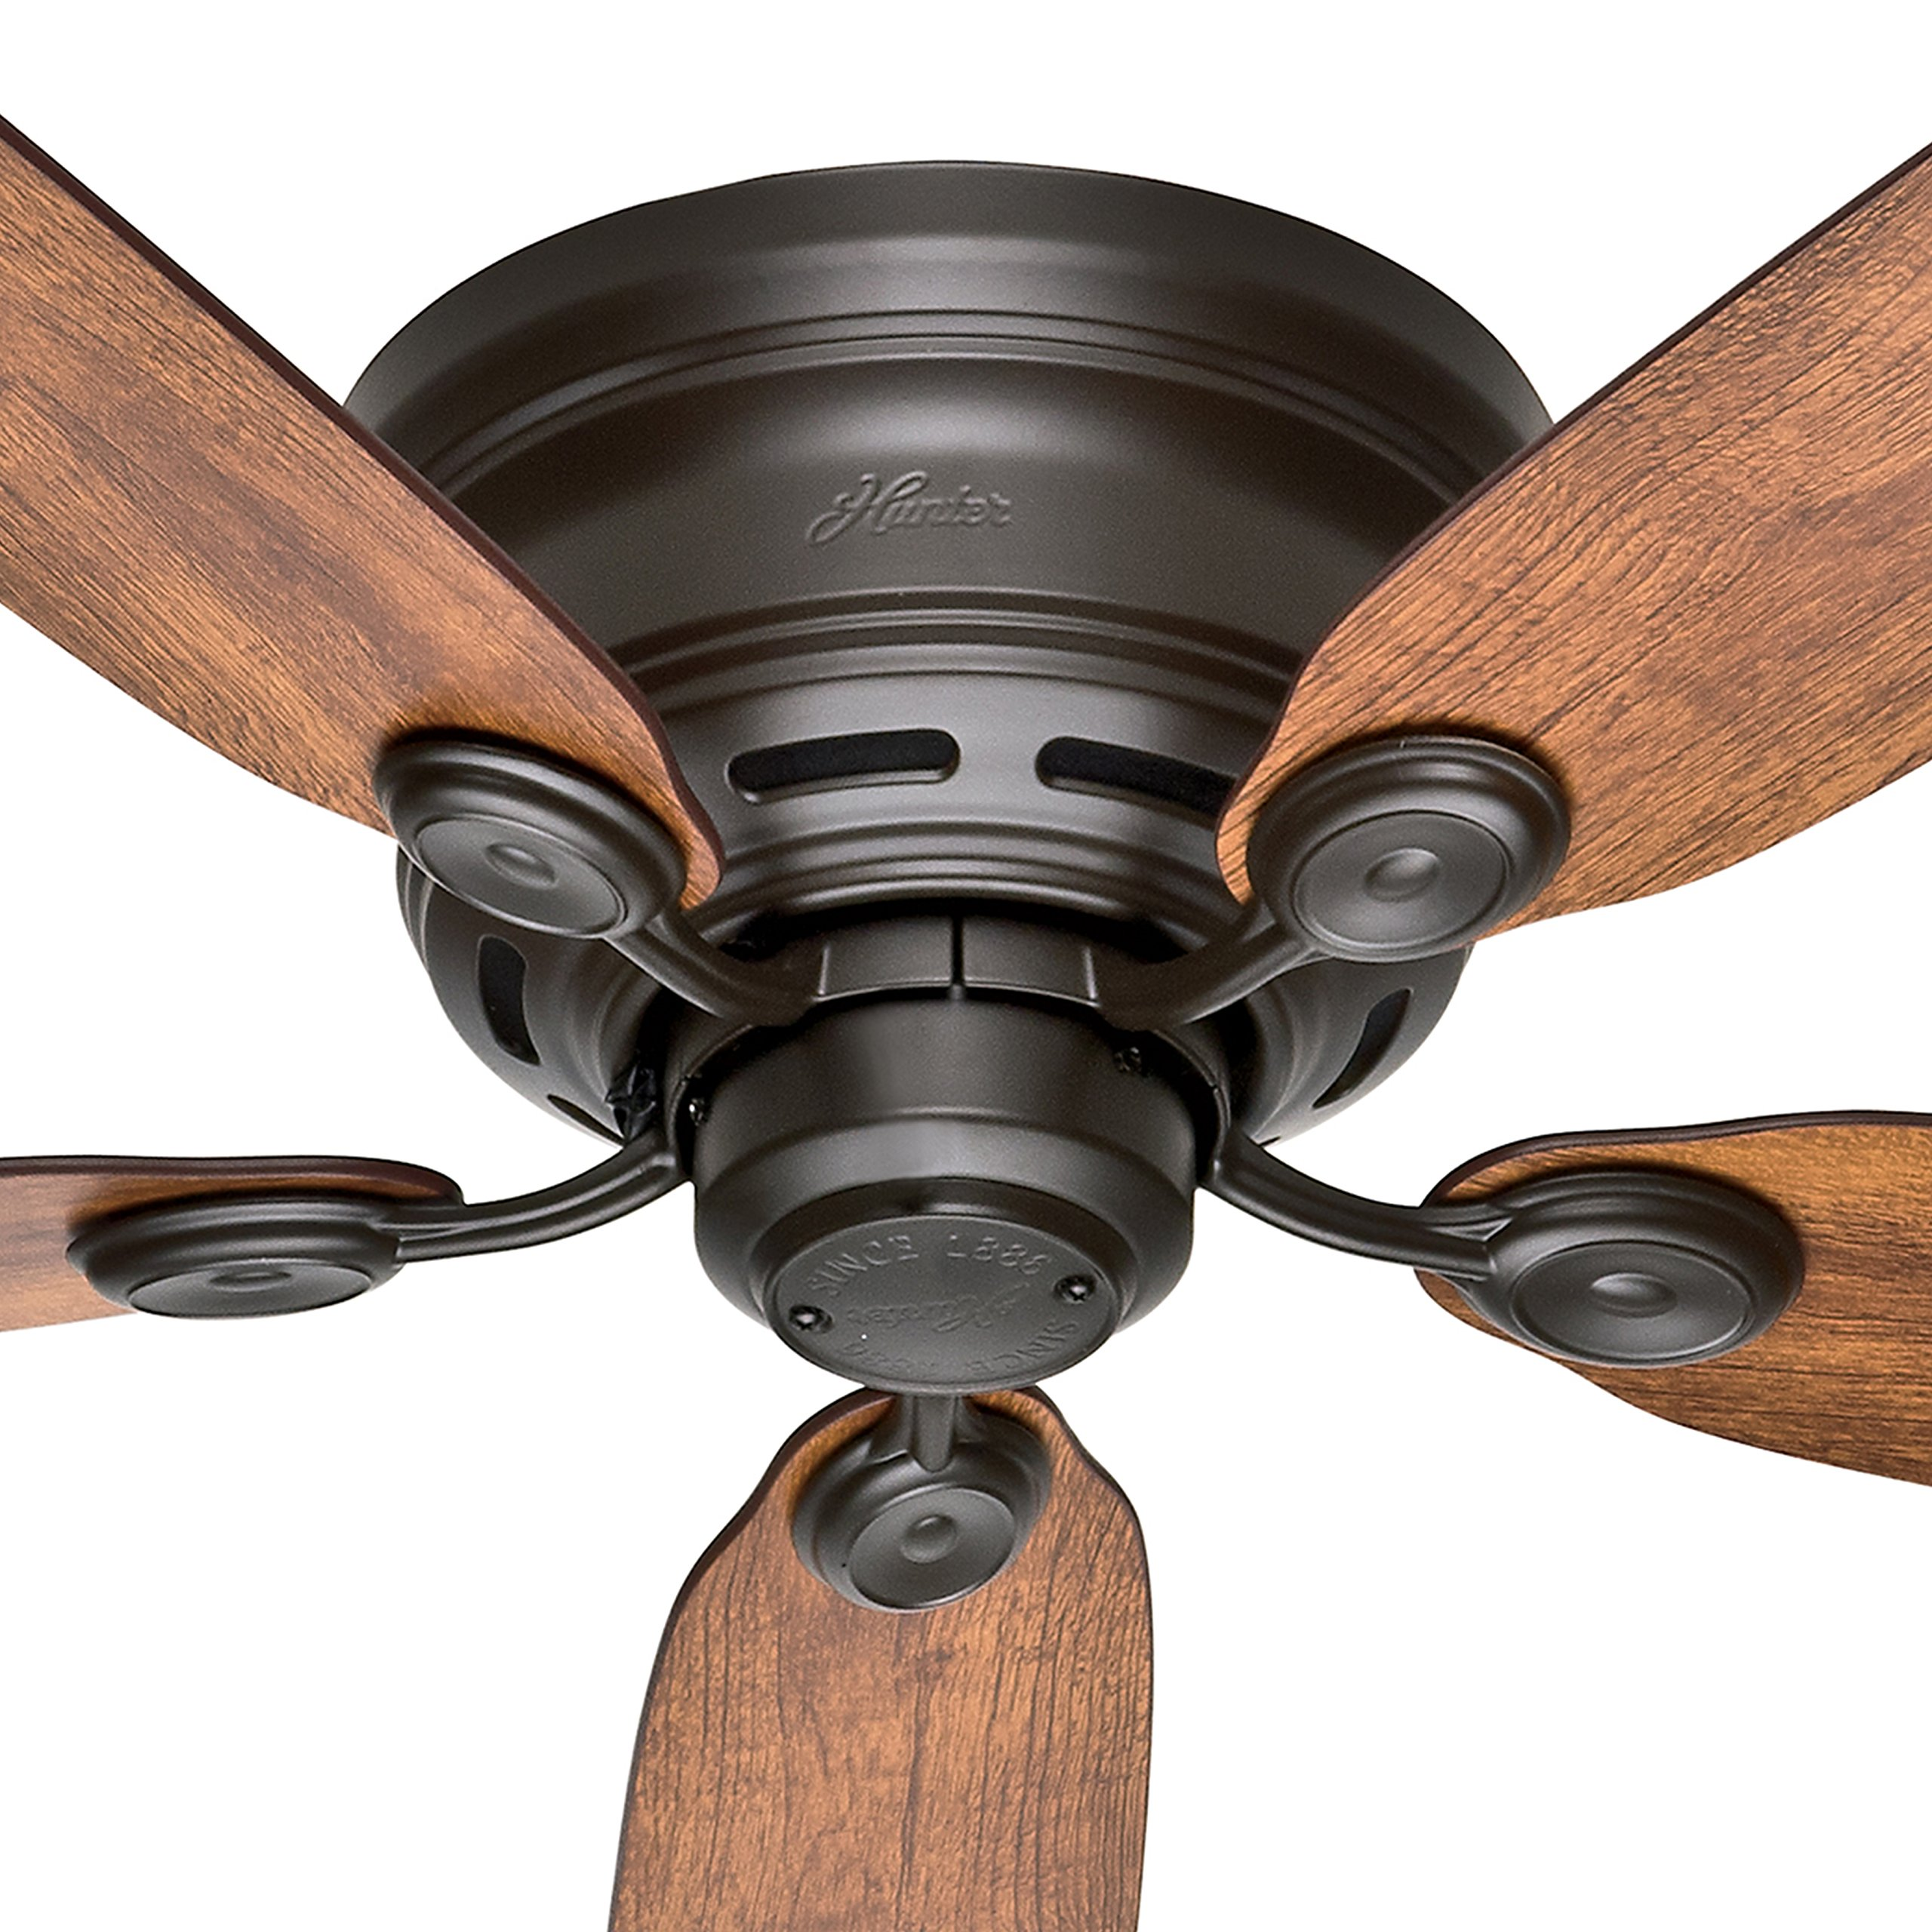 Hunter Fan 42'' New Bronze Finish Low Profile Ceiling Fan with Reversible Weathered Oak / Wine Country Blades (Certified Refurbished) by Hunter Fan Company (Image #3)